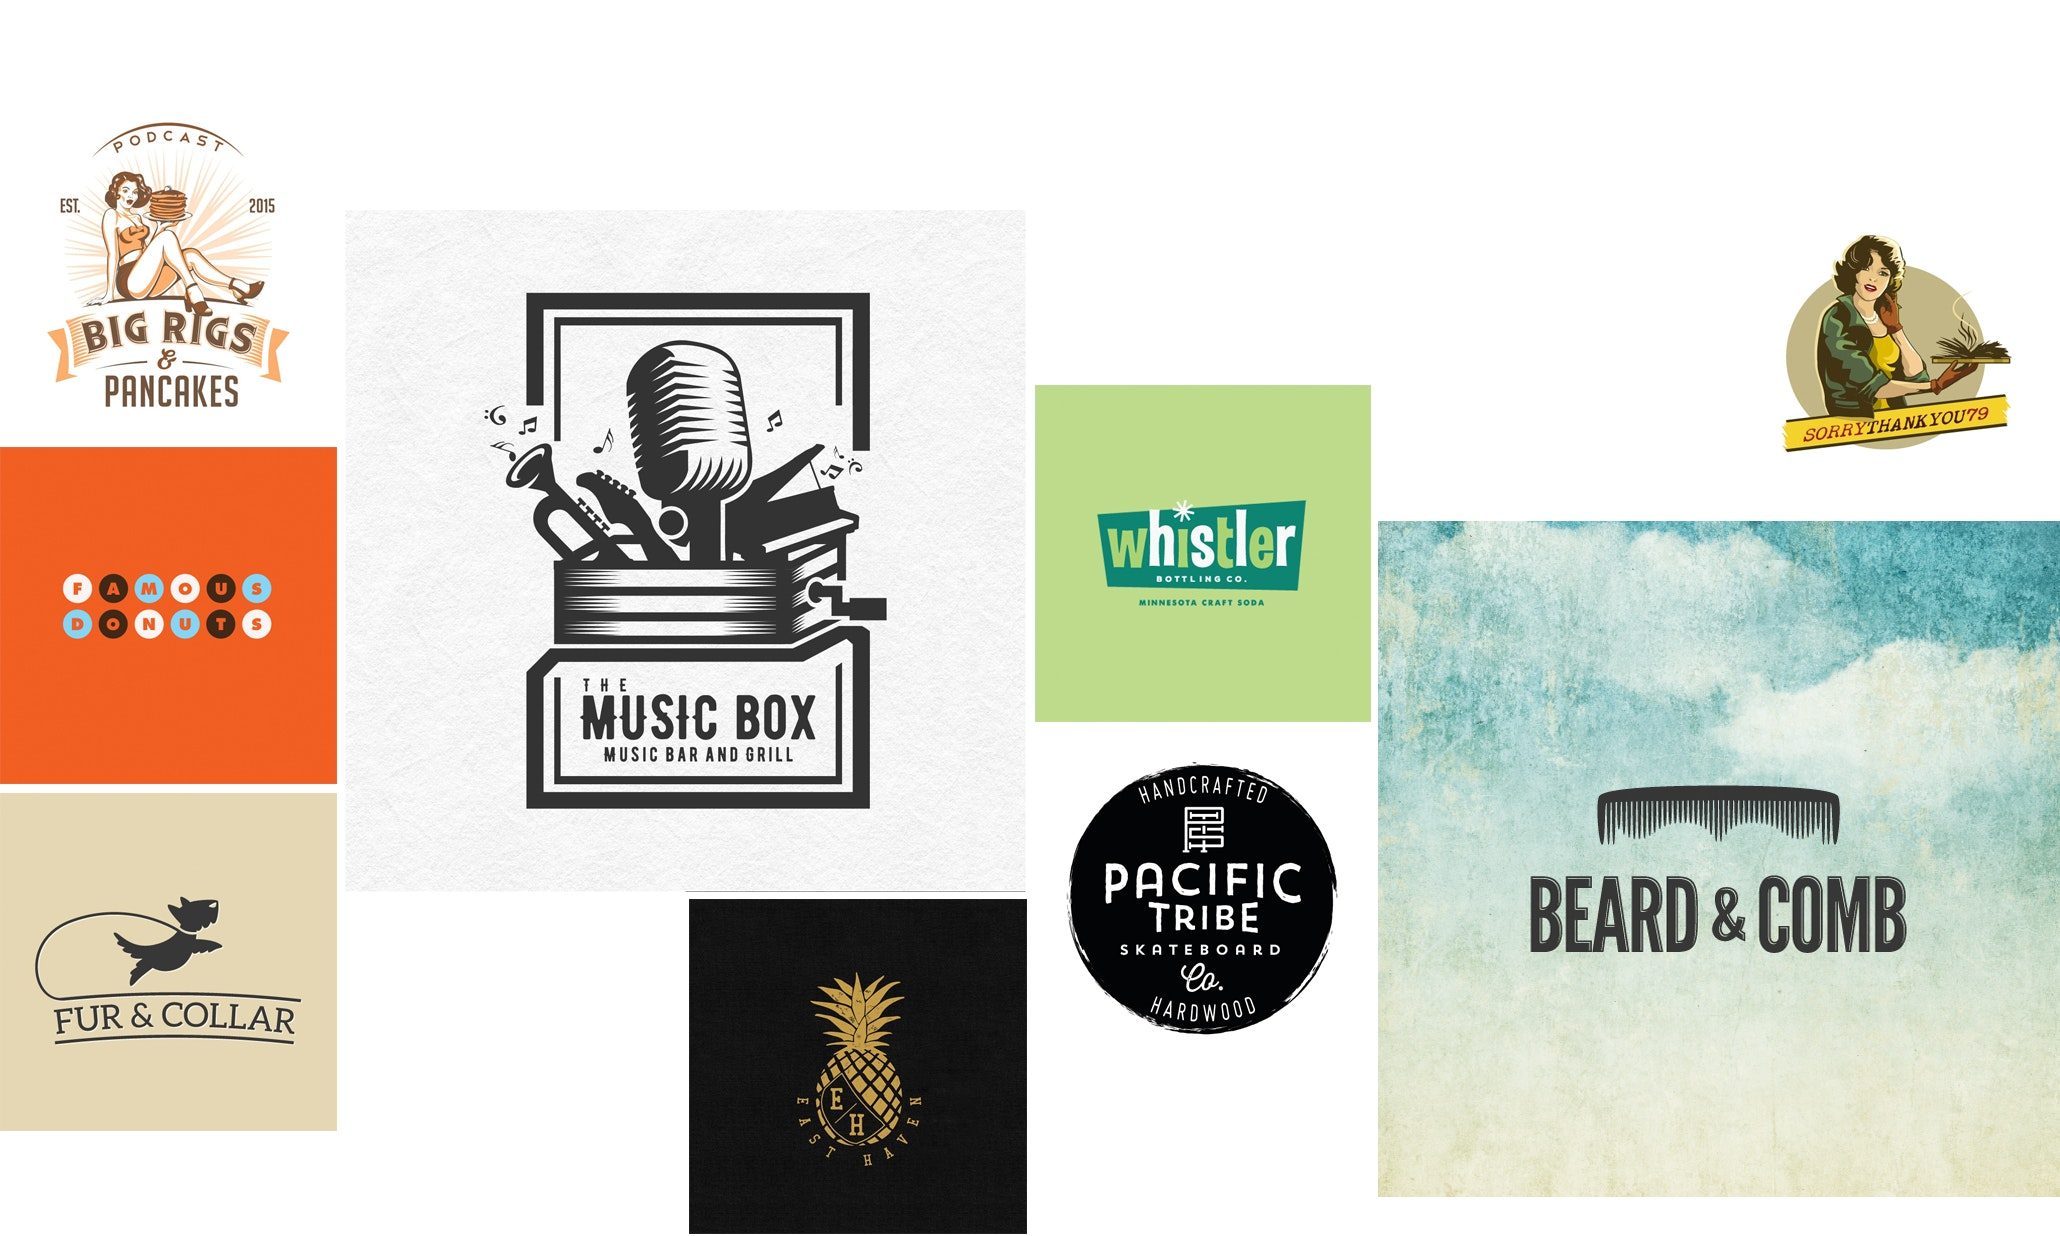 23 of the coolest vintage and retro logos 99designs rh 99designs com